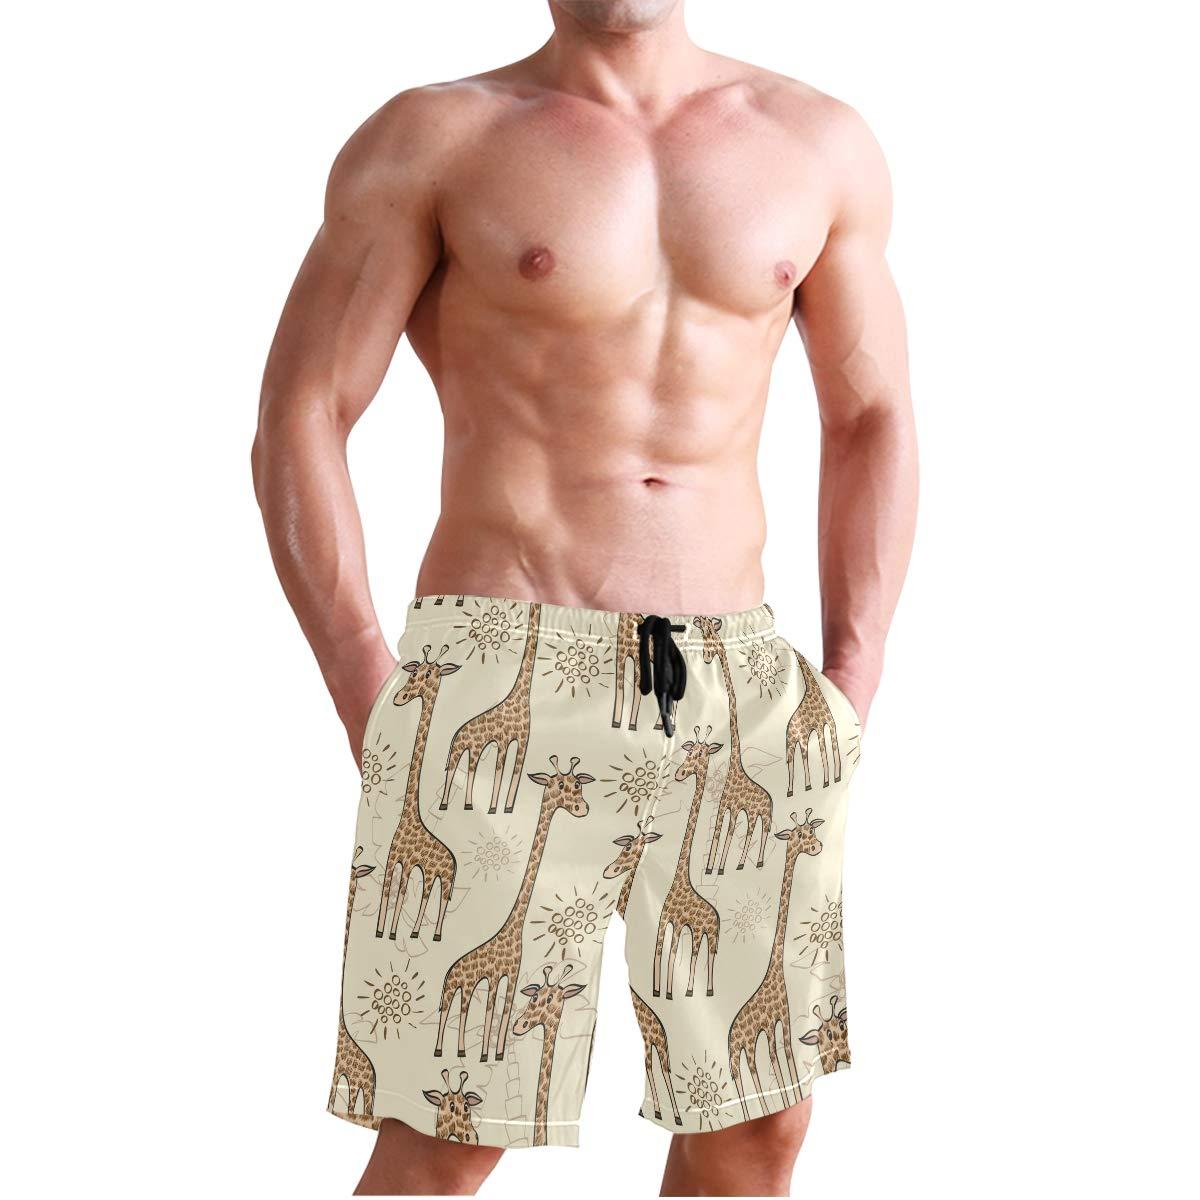 WIHVE Mens Swim Trunks Cute Giraffe Quick Dry Beach Board Short with Mesh Lining